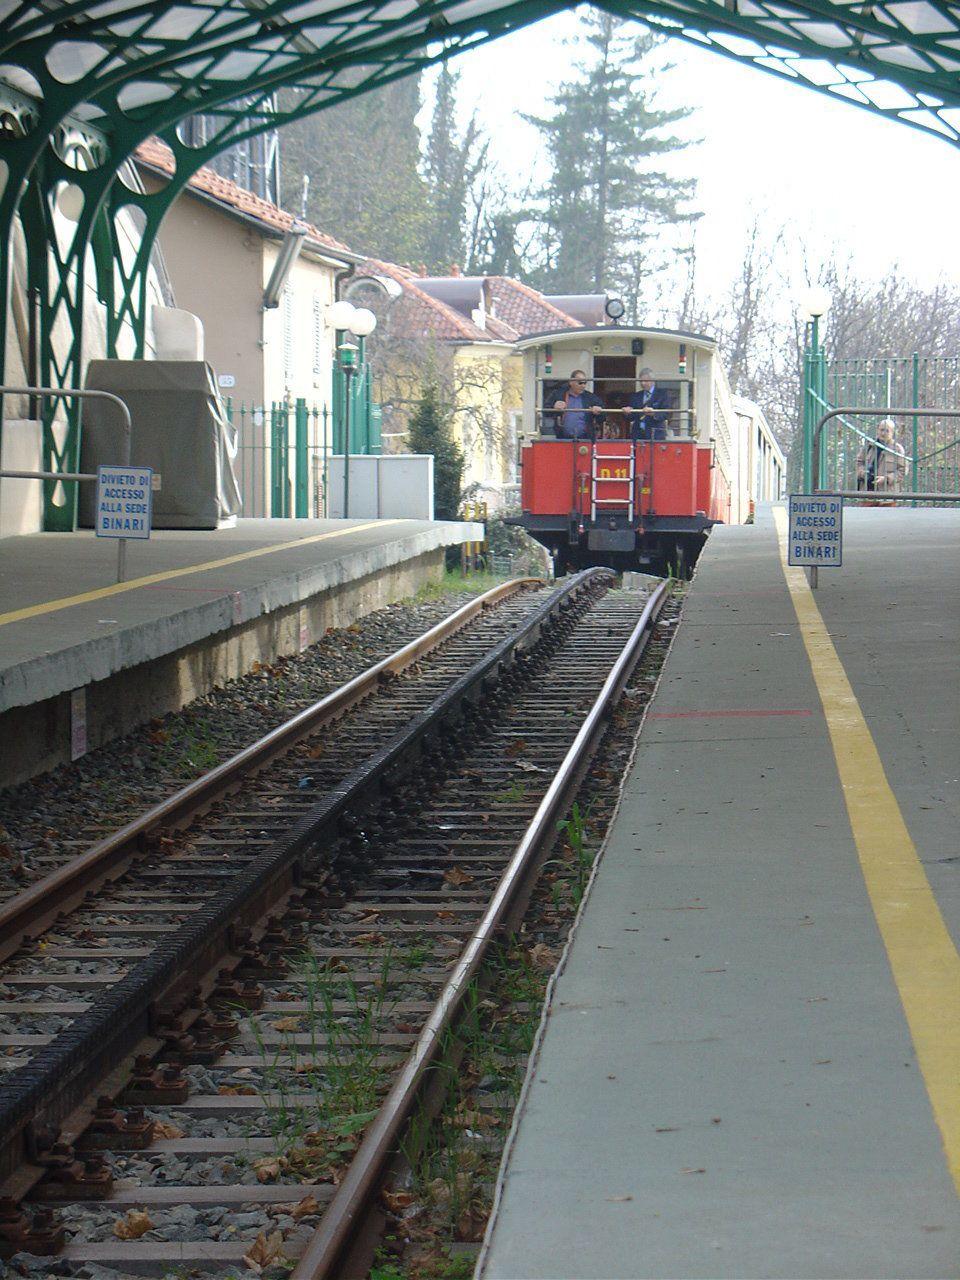 In arrivo alla stazione di Superga